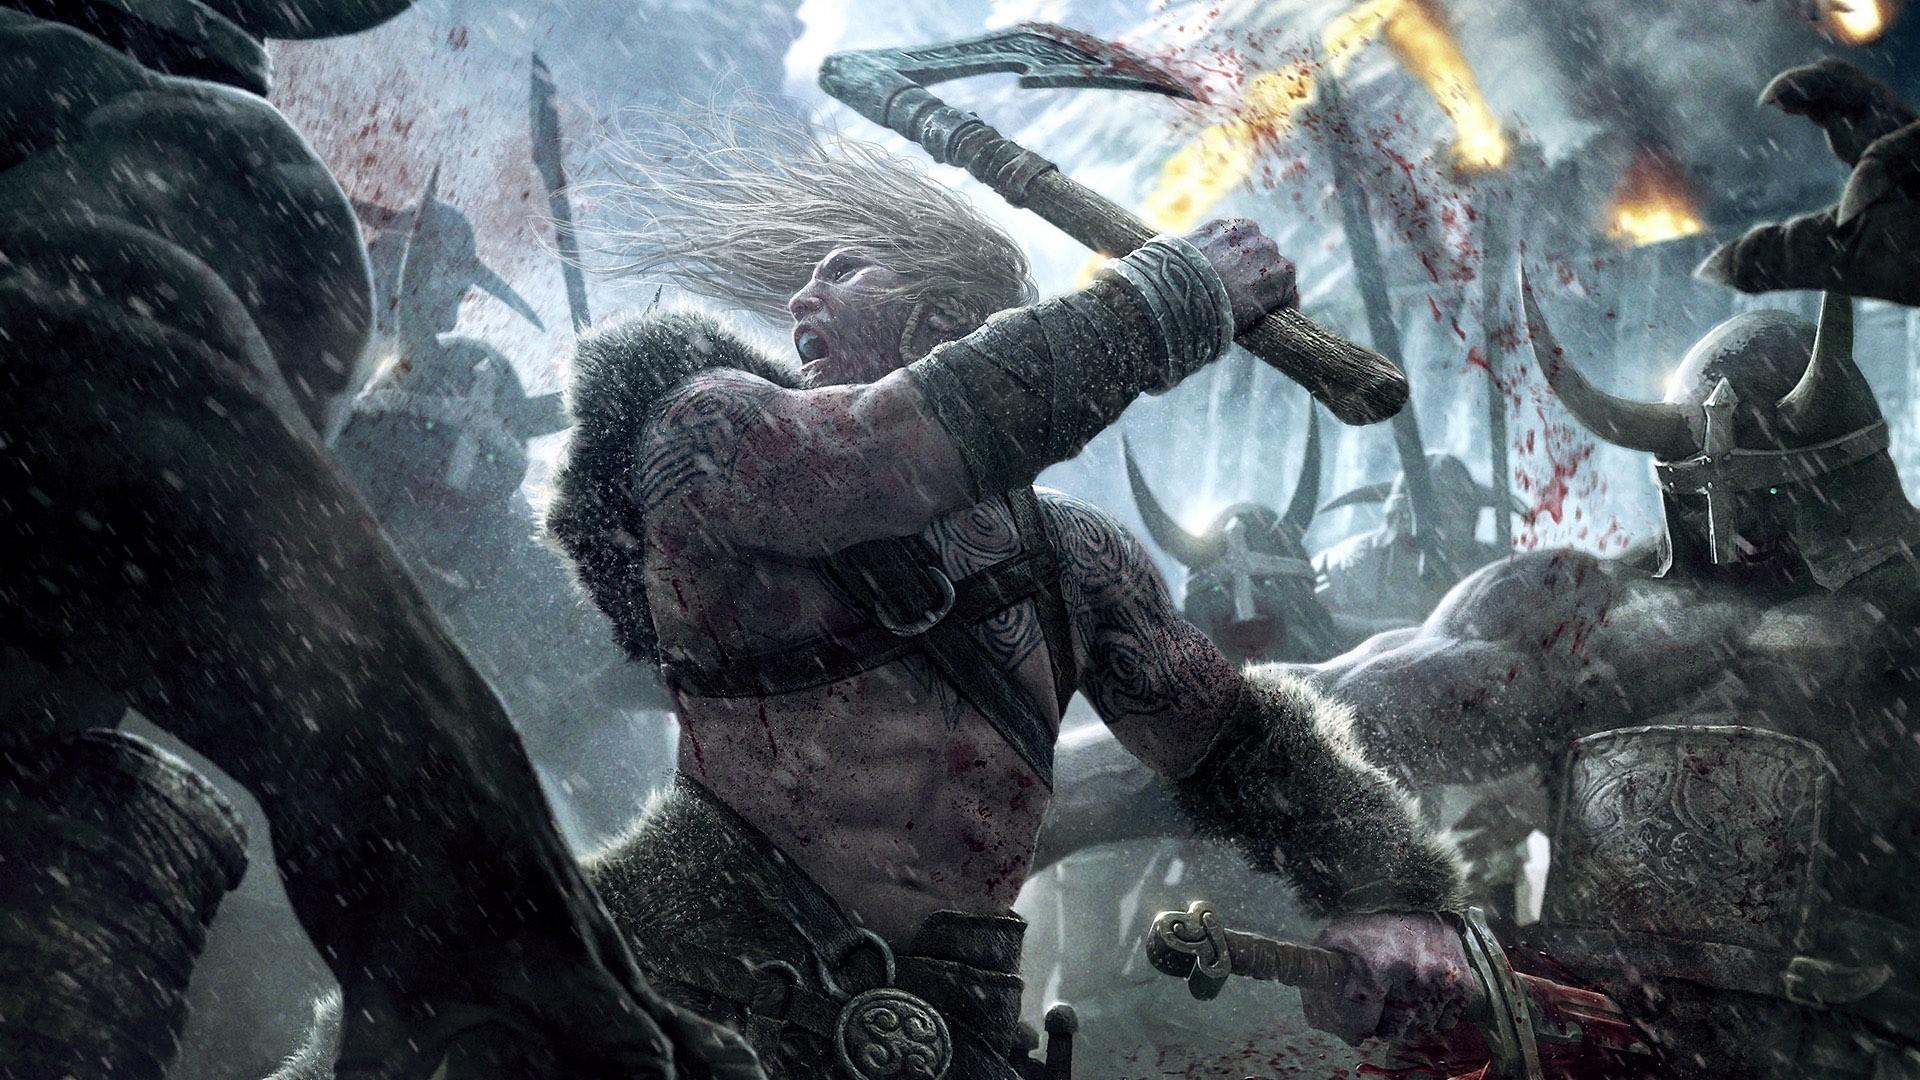 Viking Battle for Asgard wallpaper 9368 1920x1080